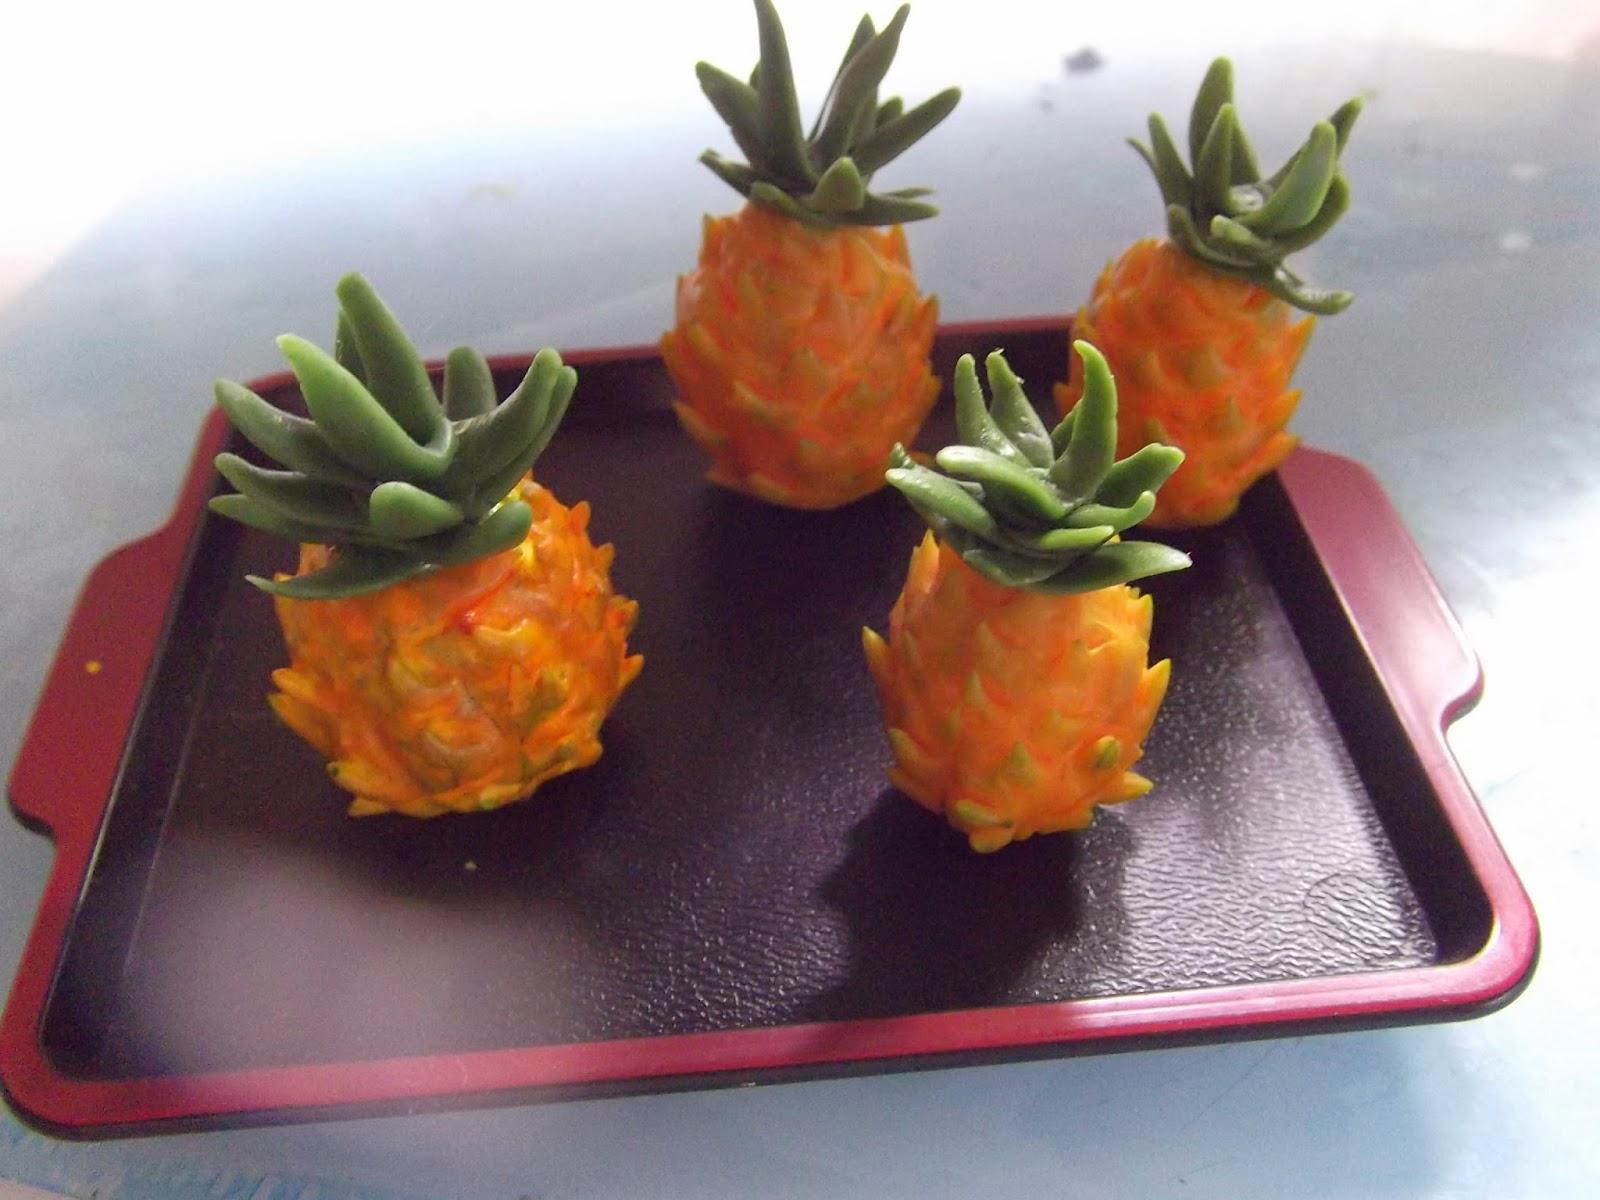 Dollhouse miniature handmade half-cut durian